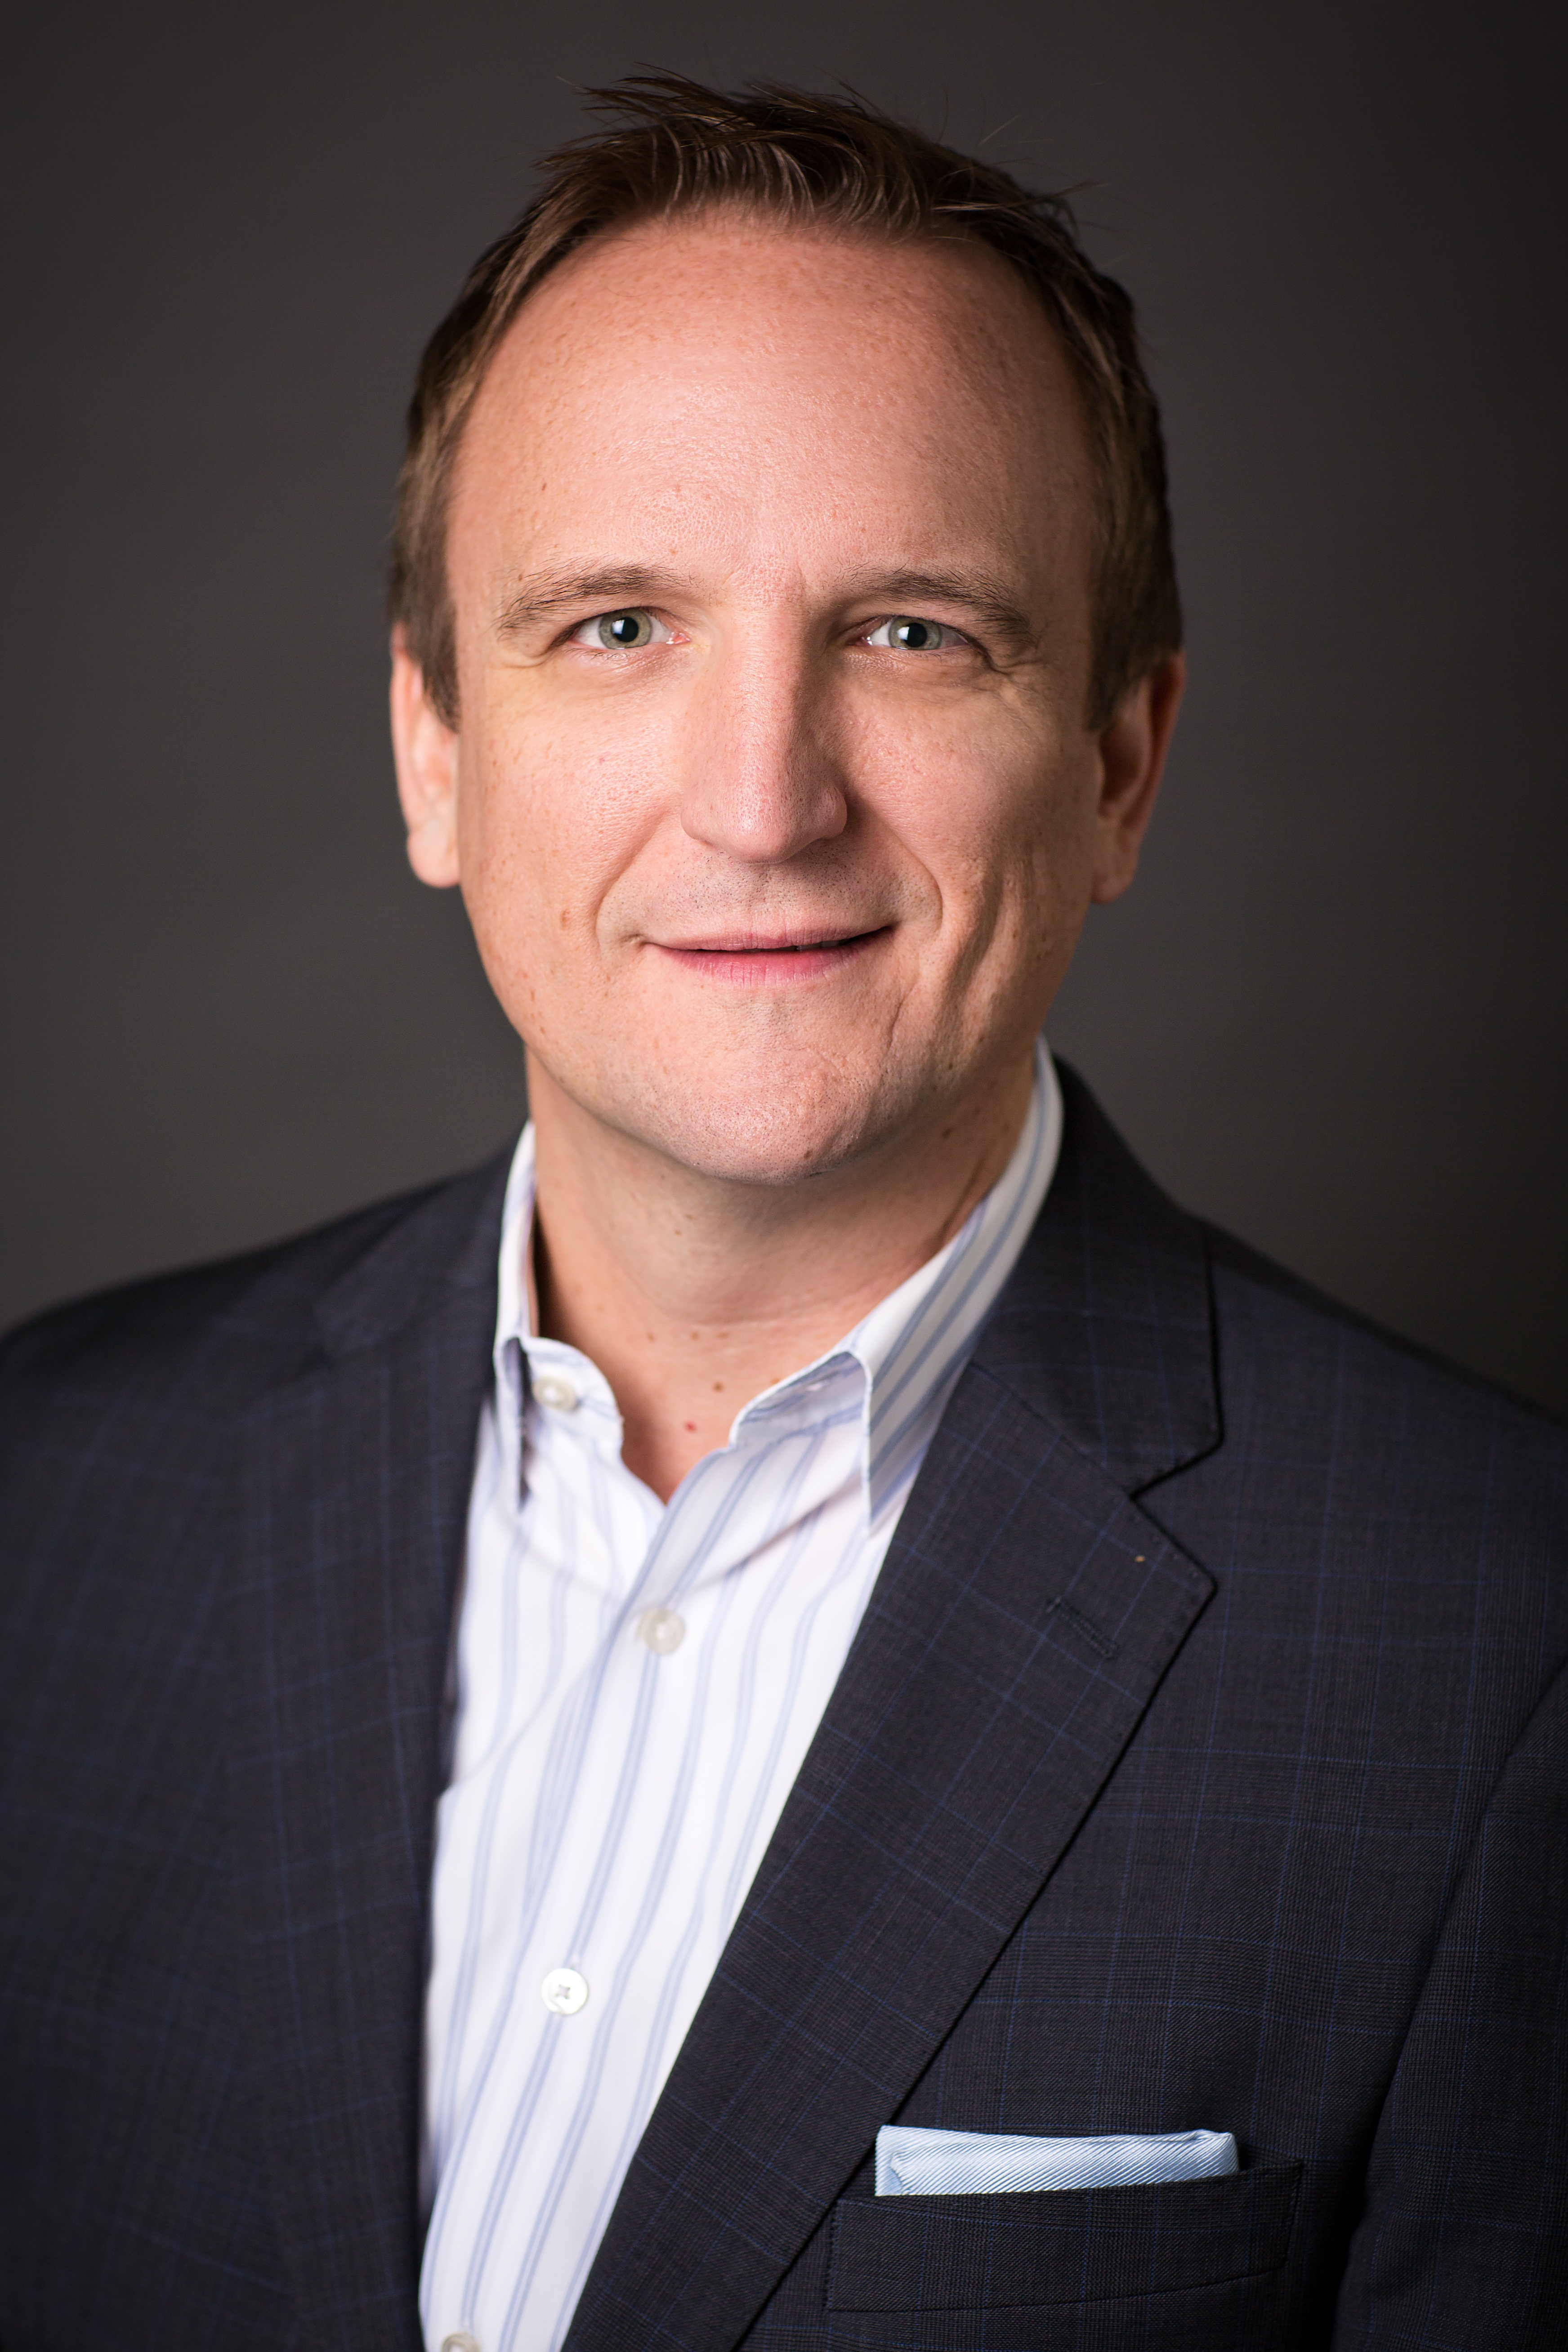 Trevor T. Calton, MBA